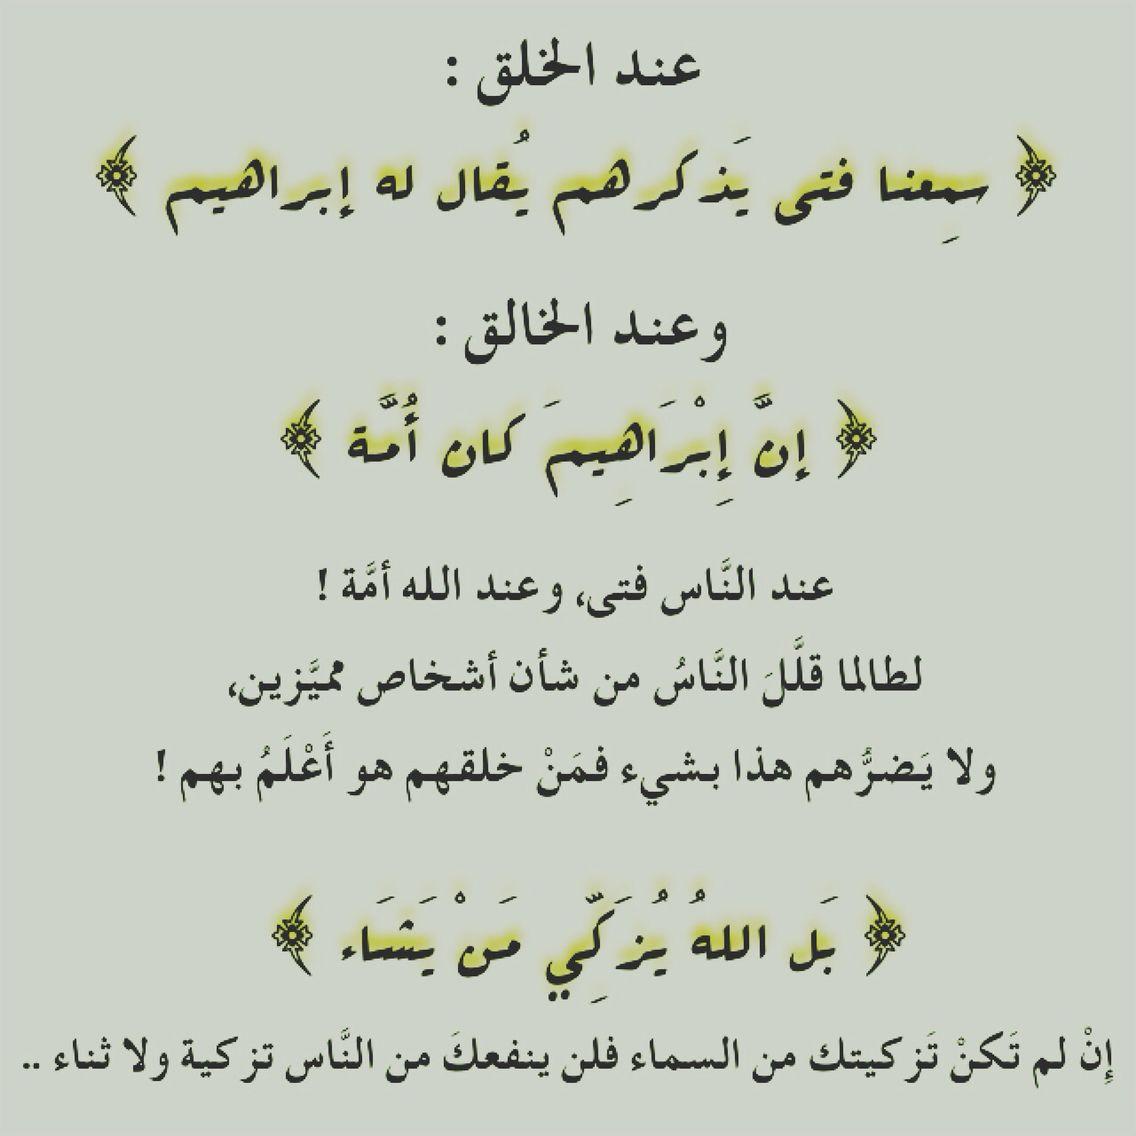 Pin By أبو عبدالله On كلمات ثناء وتسبيح وتمجيد لله Calligraphy Arabic Calligraphy Arabic